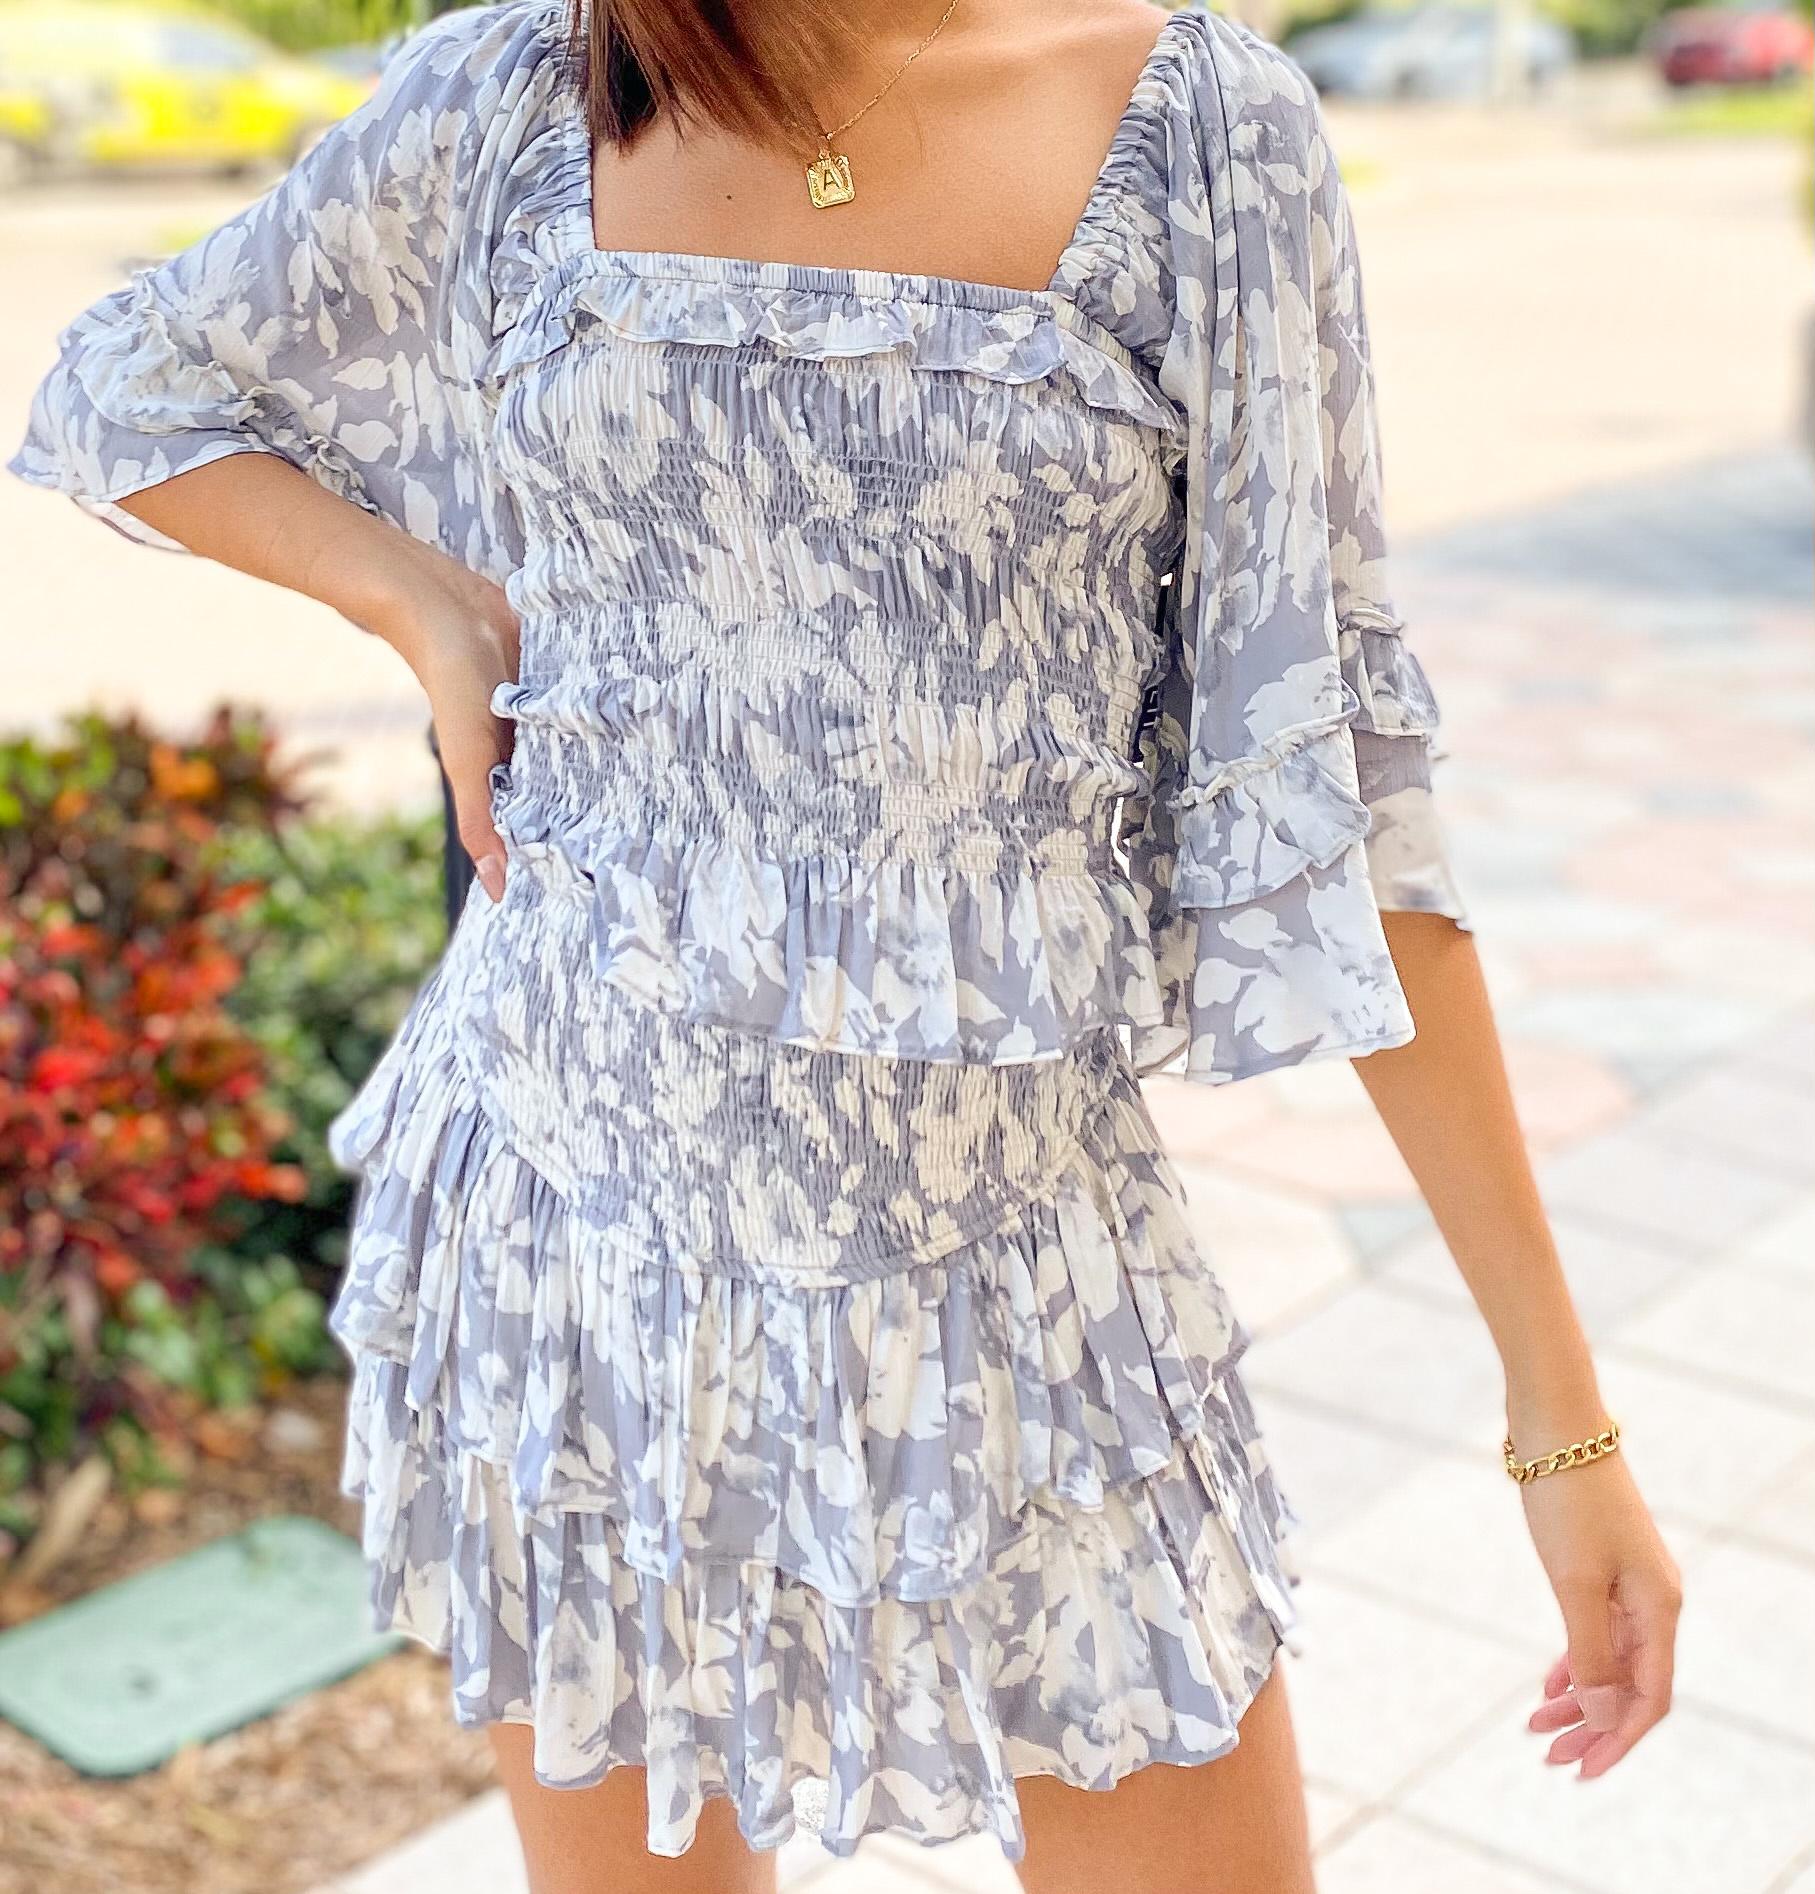 Marbella Skirt